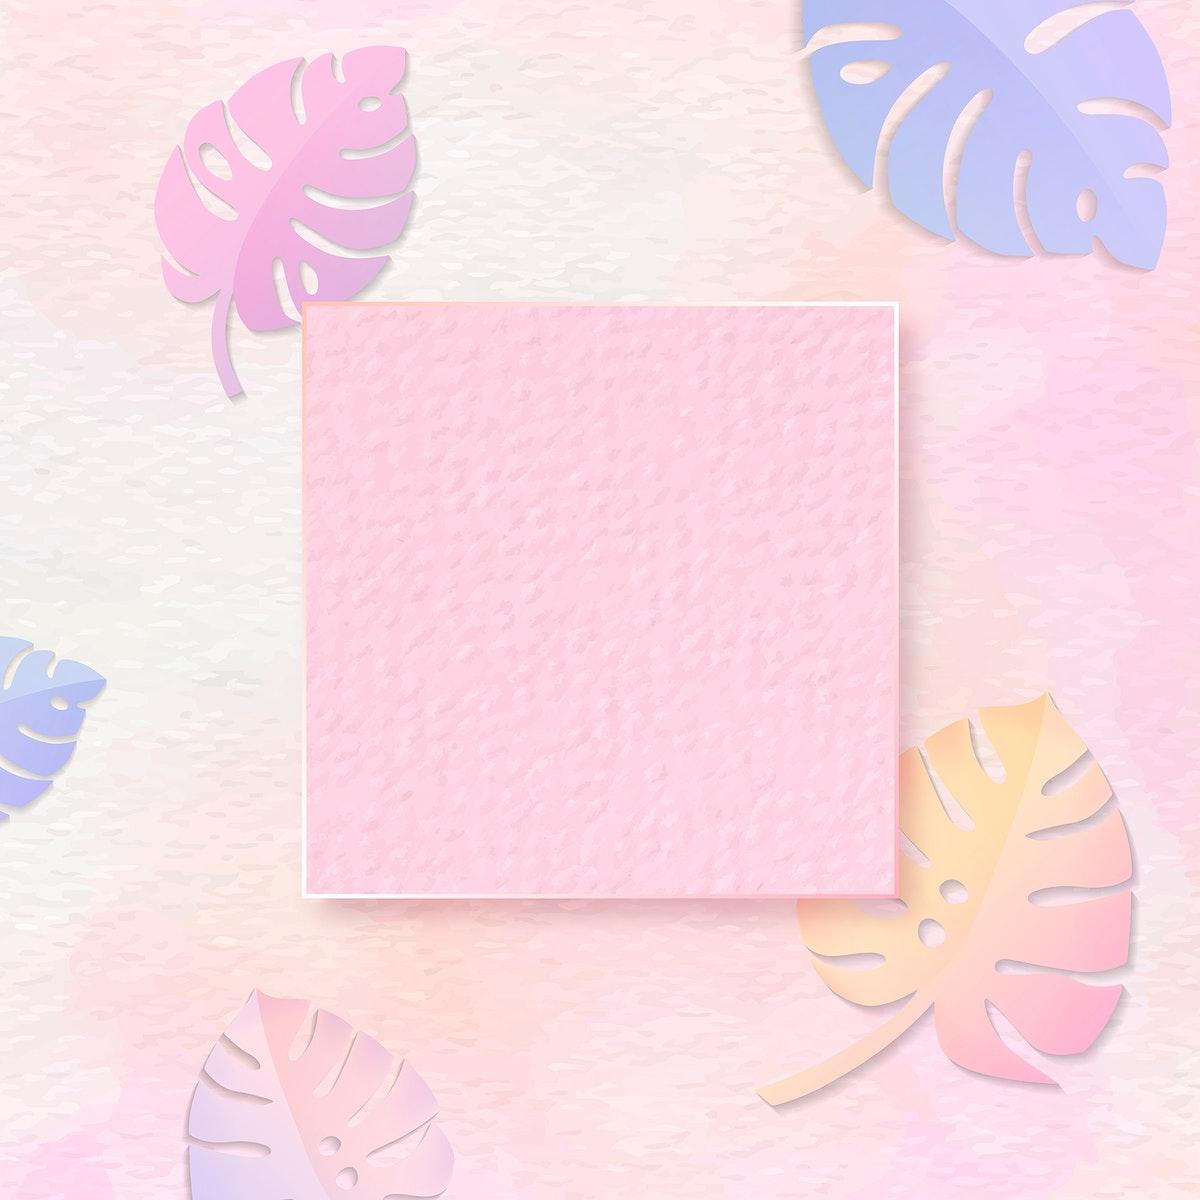 Blank frame on pastel monstera patterned background vector